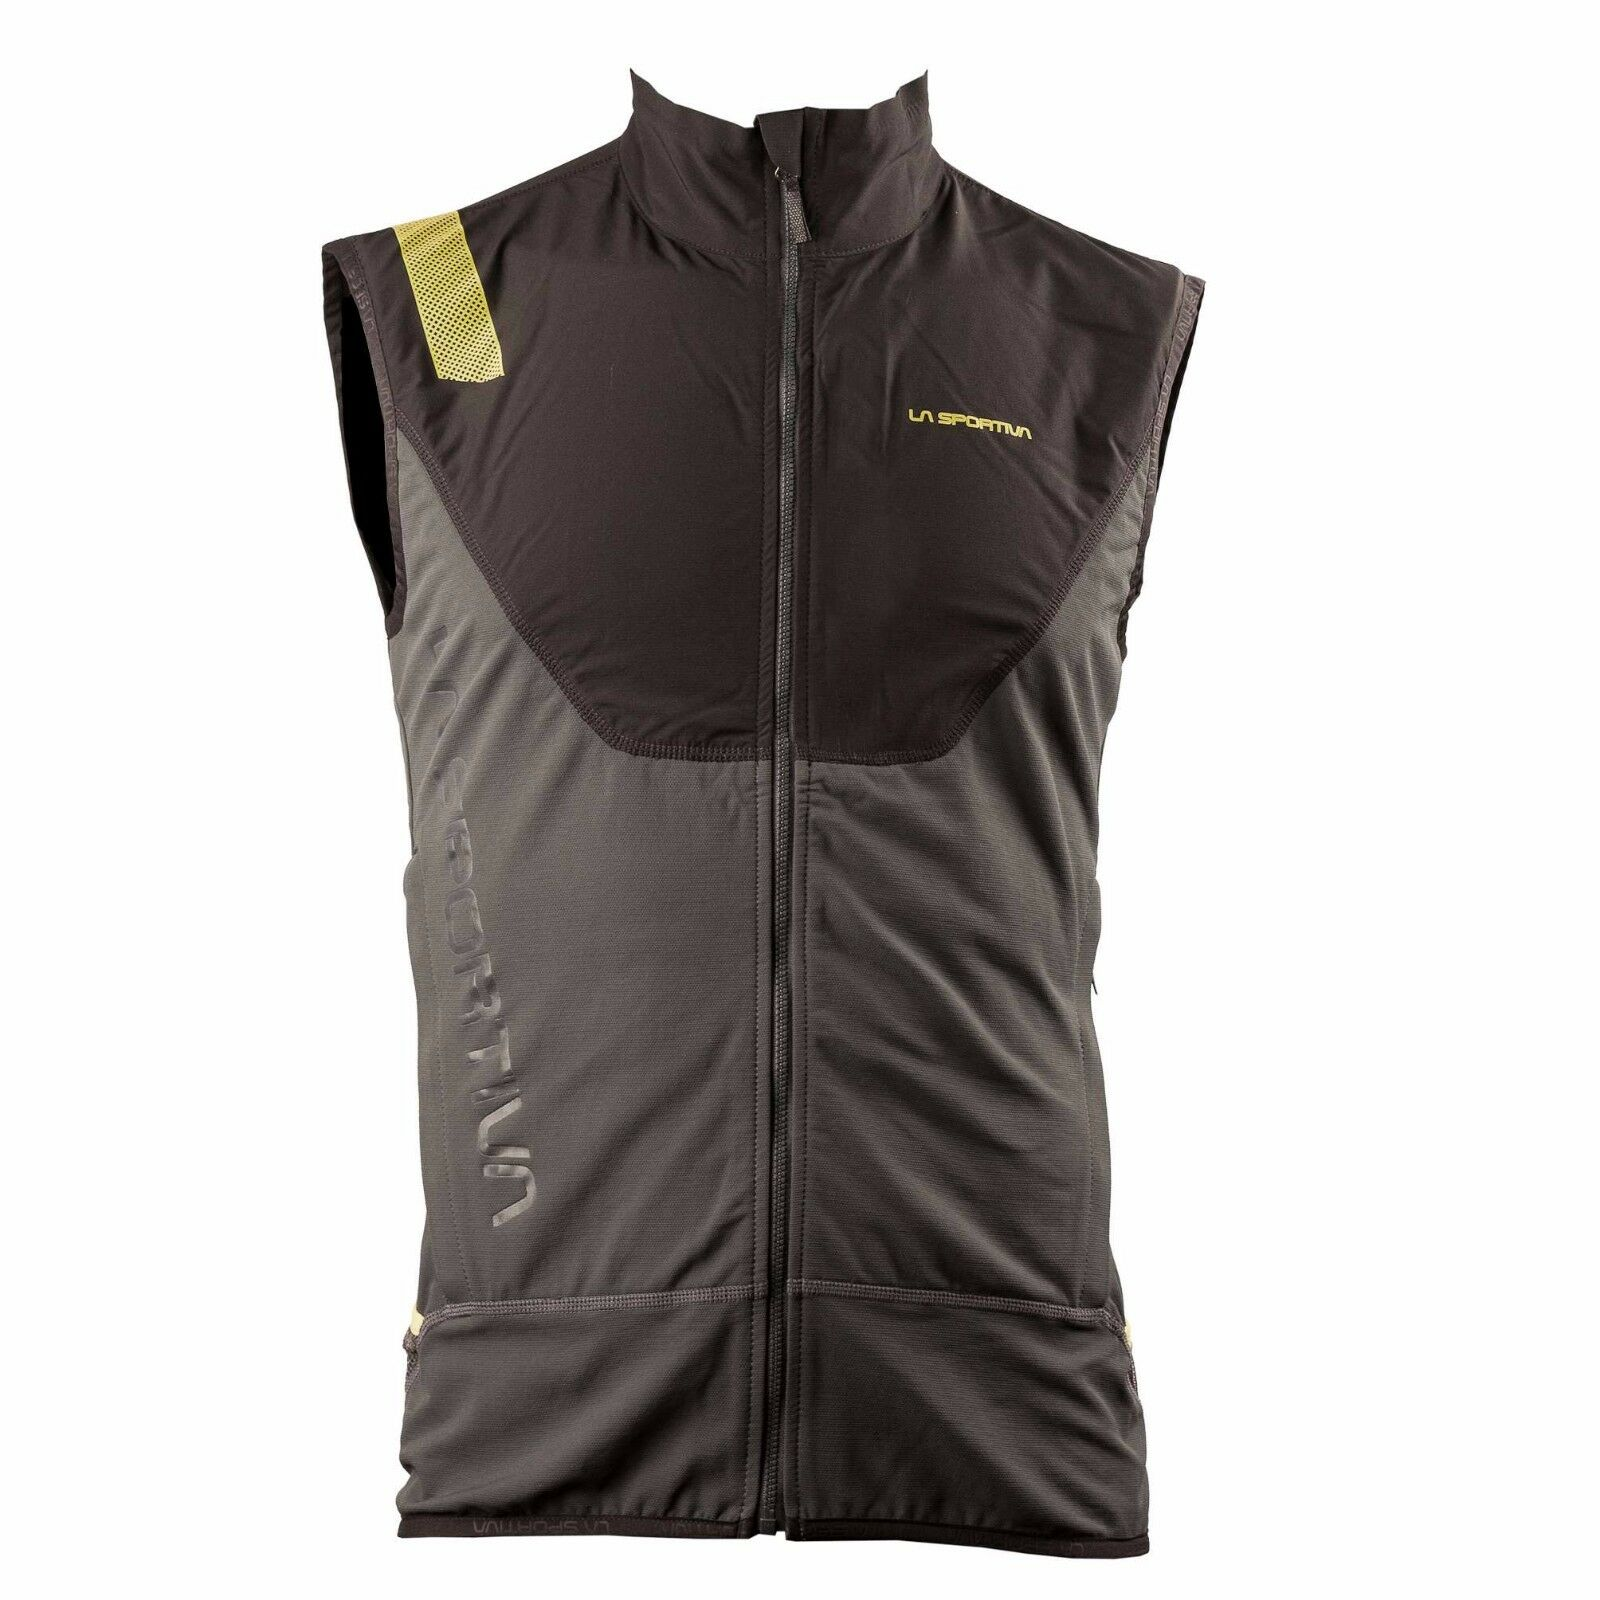 La Sportiva Stratos Racing Vest (M) Grau Gelb